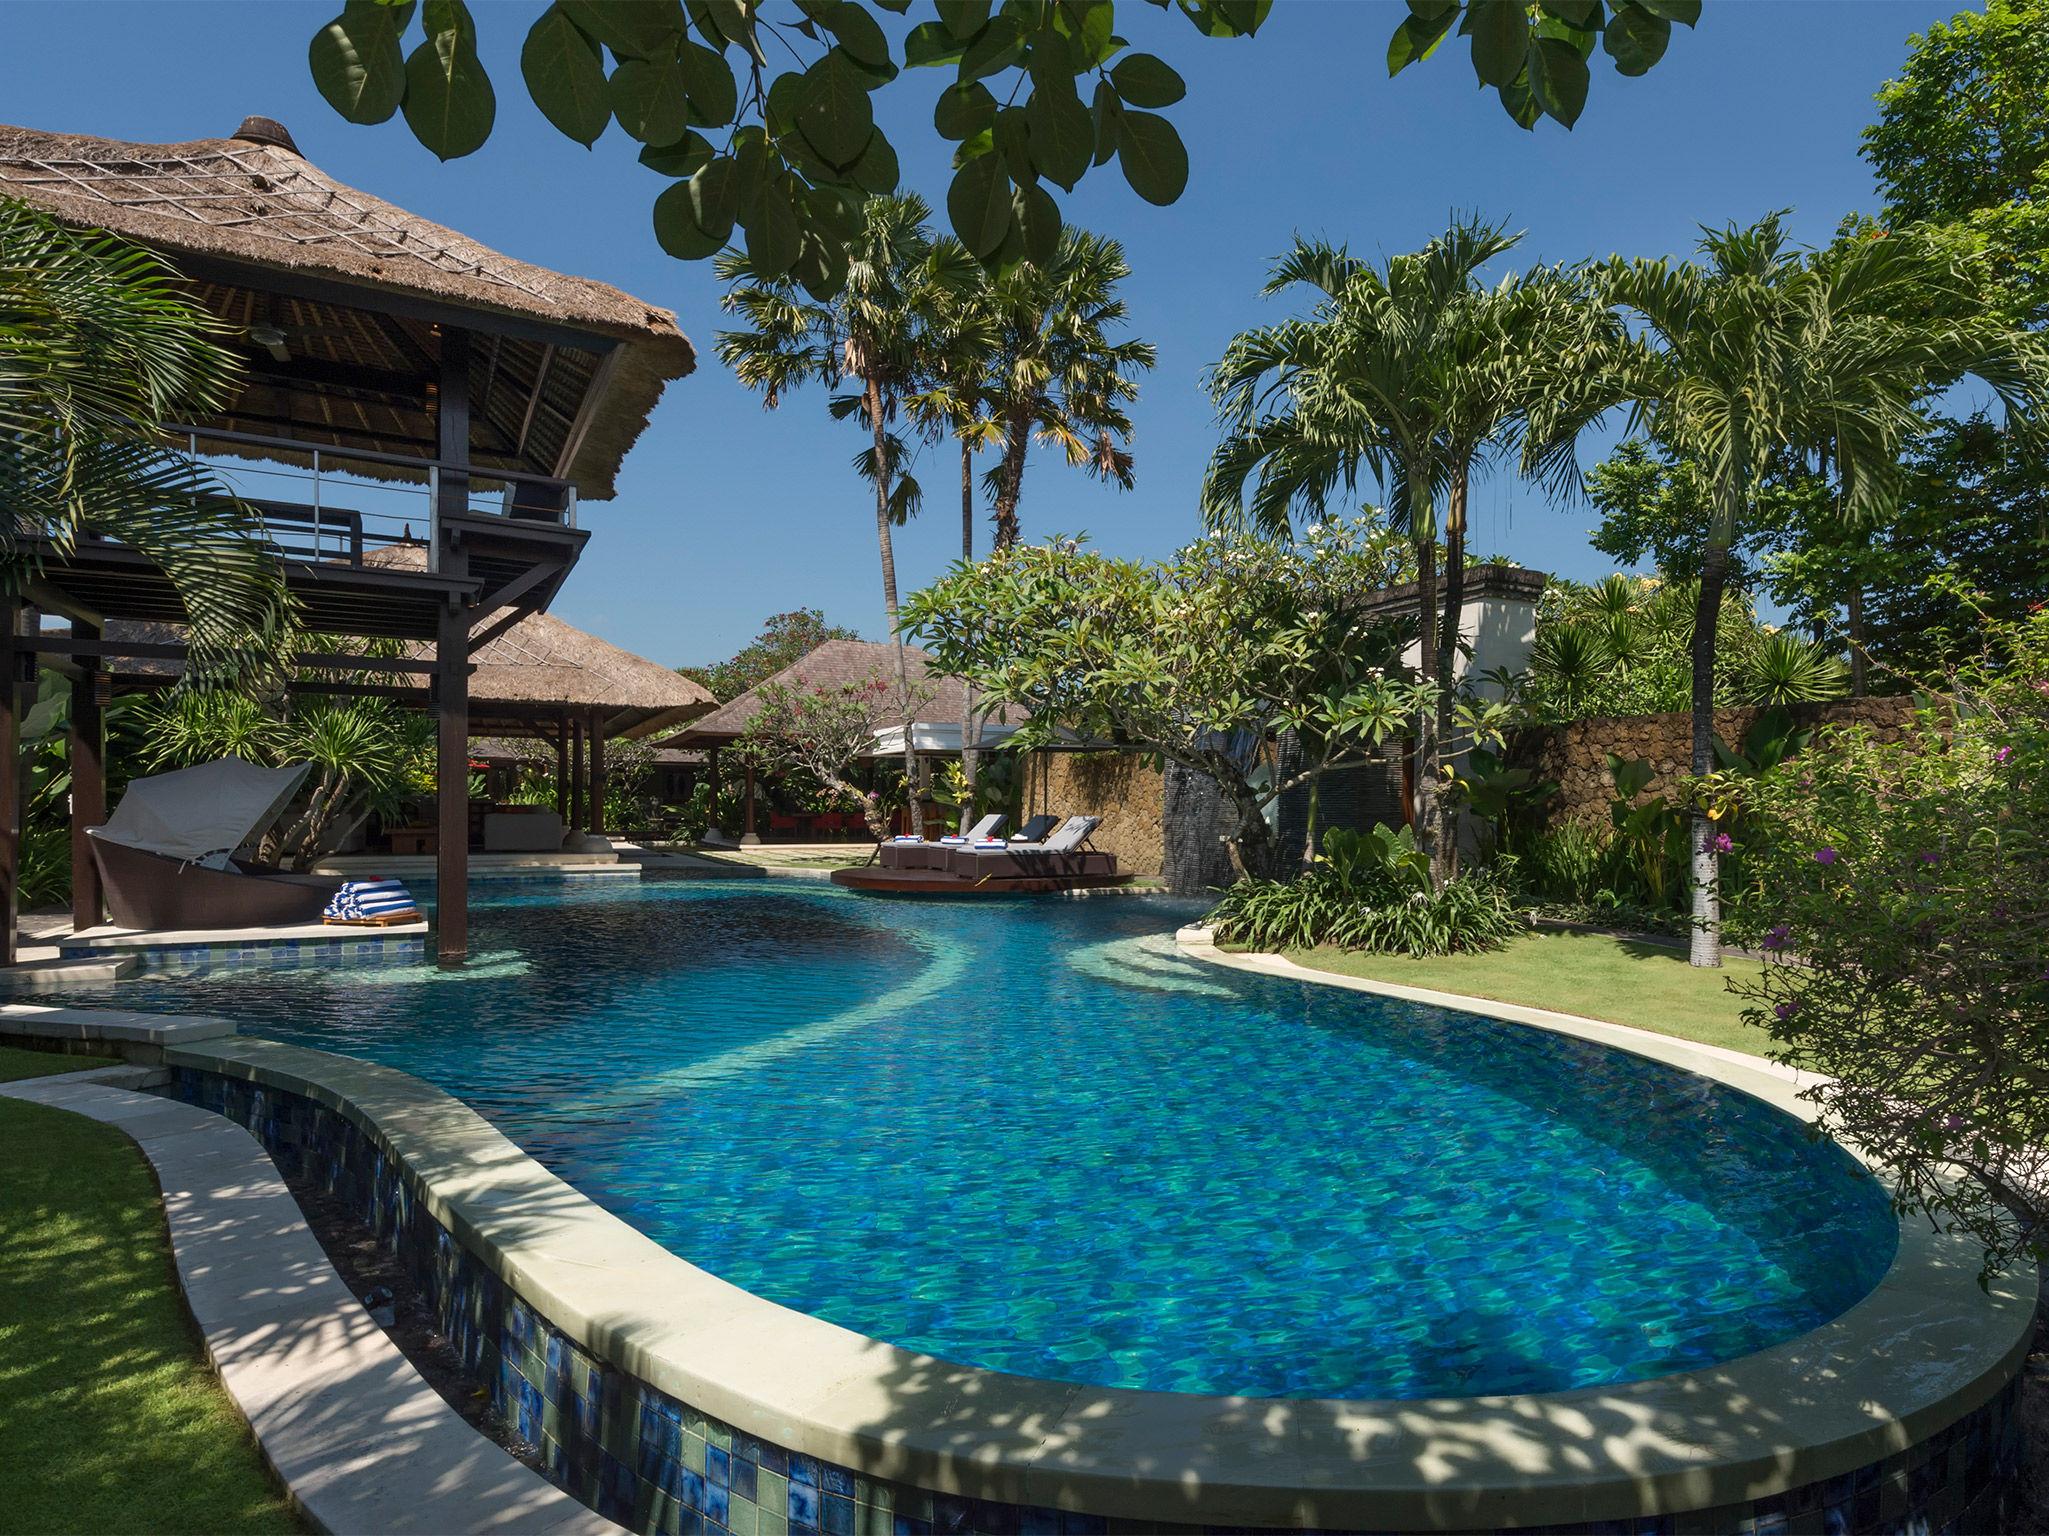 Villa Asta - The pool